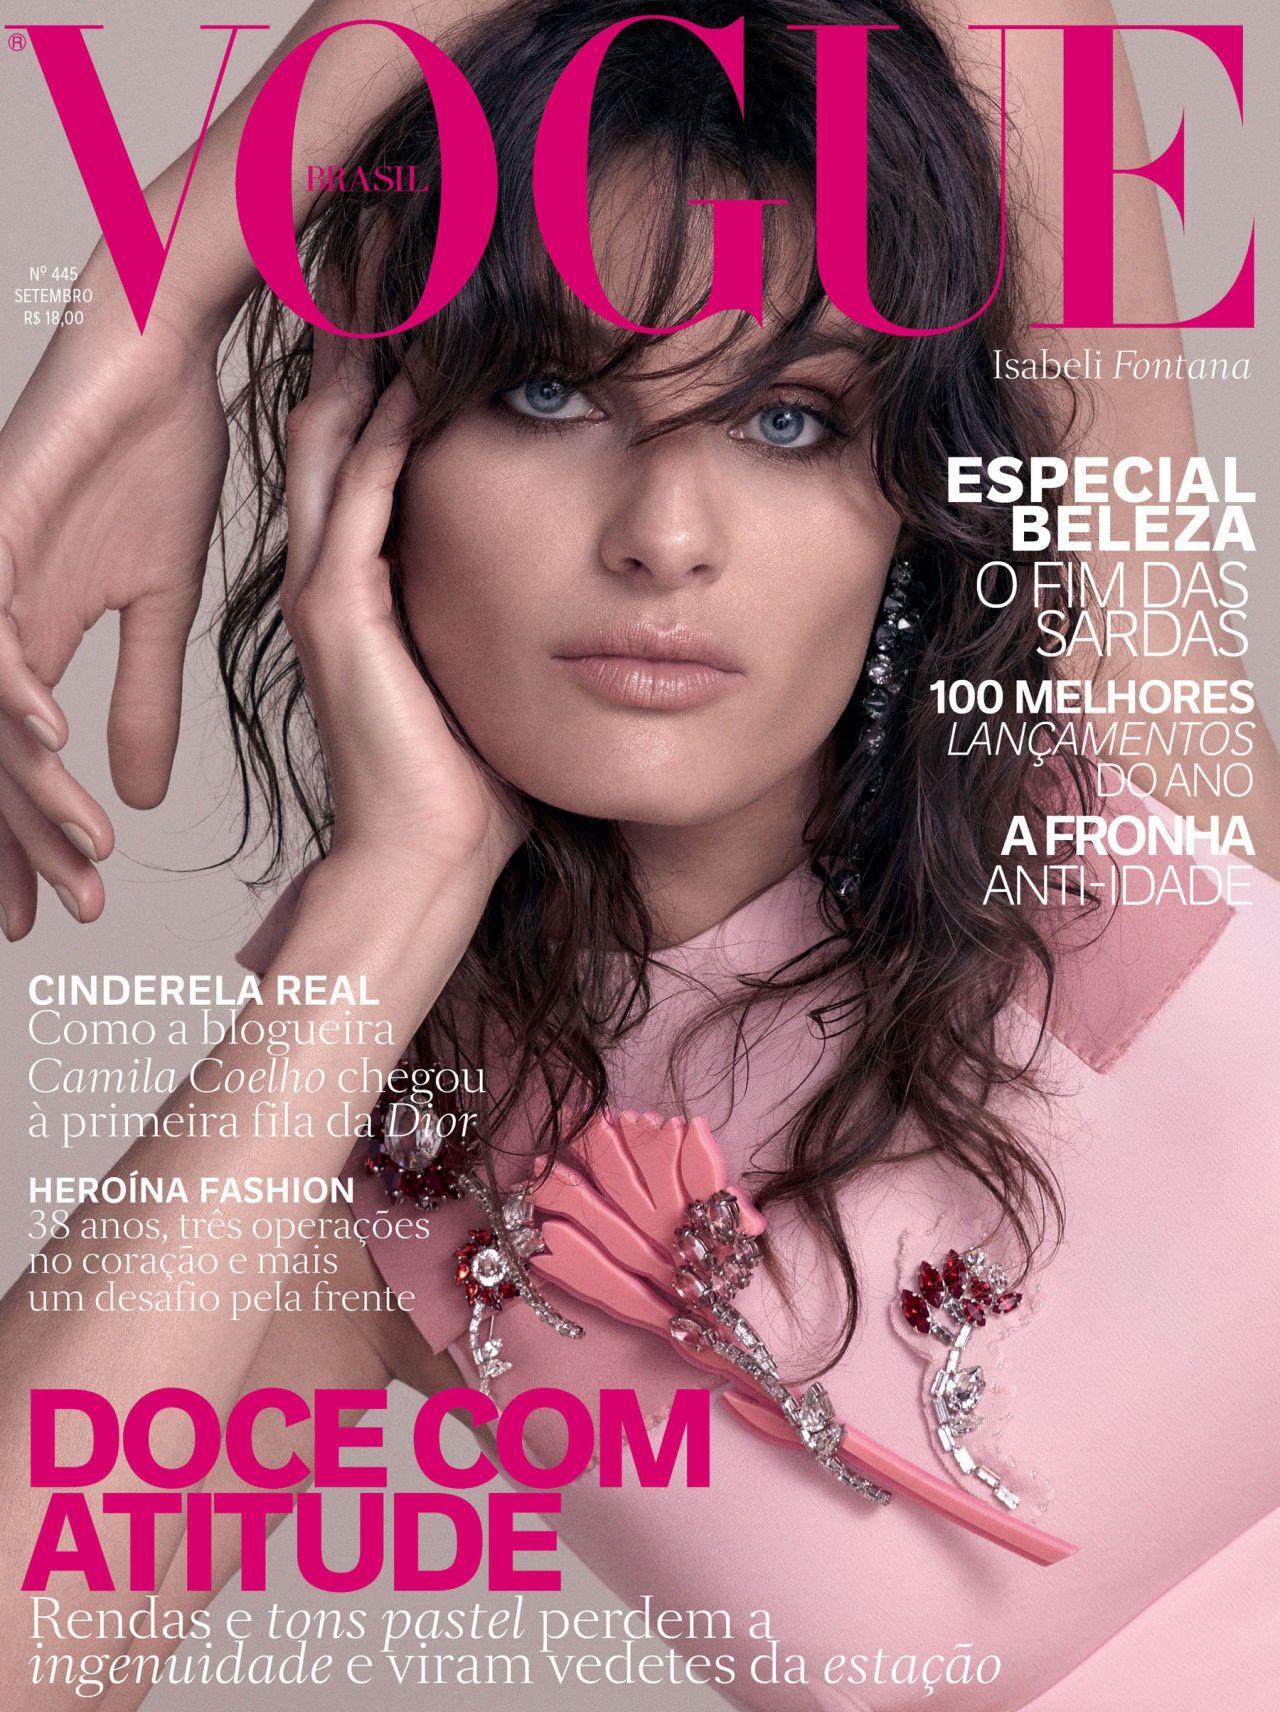 Vogue The Top Selling Fashion Magazine: Vogue Magazine Brazil